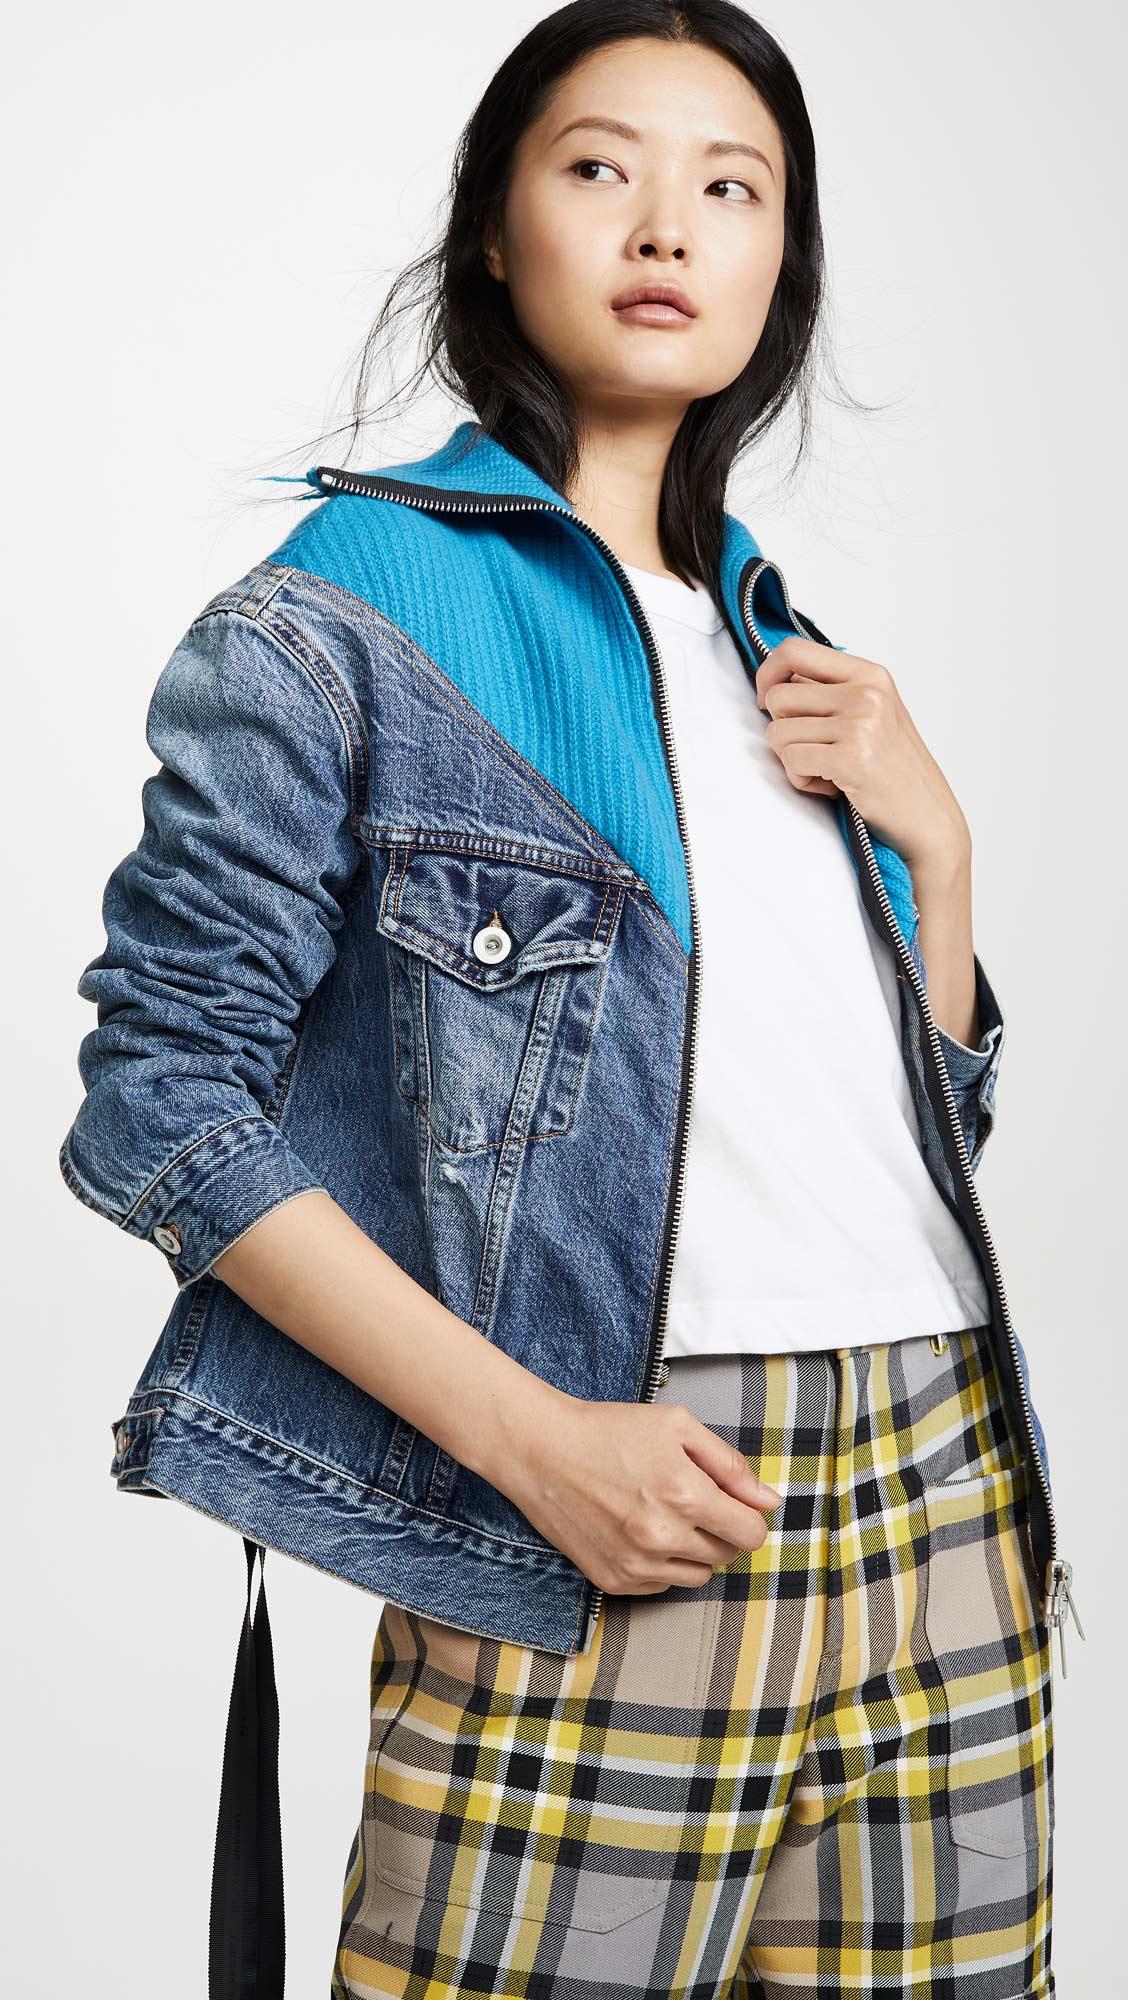 10 Cool Autumn Denim Jackets To Own